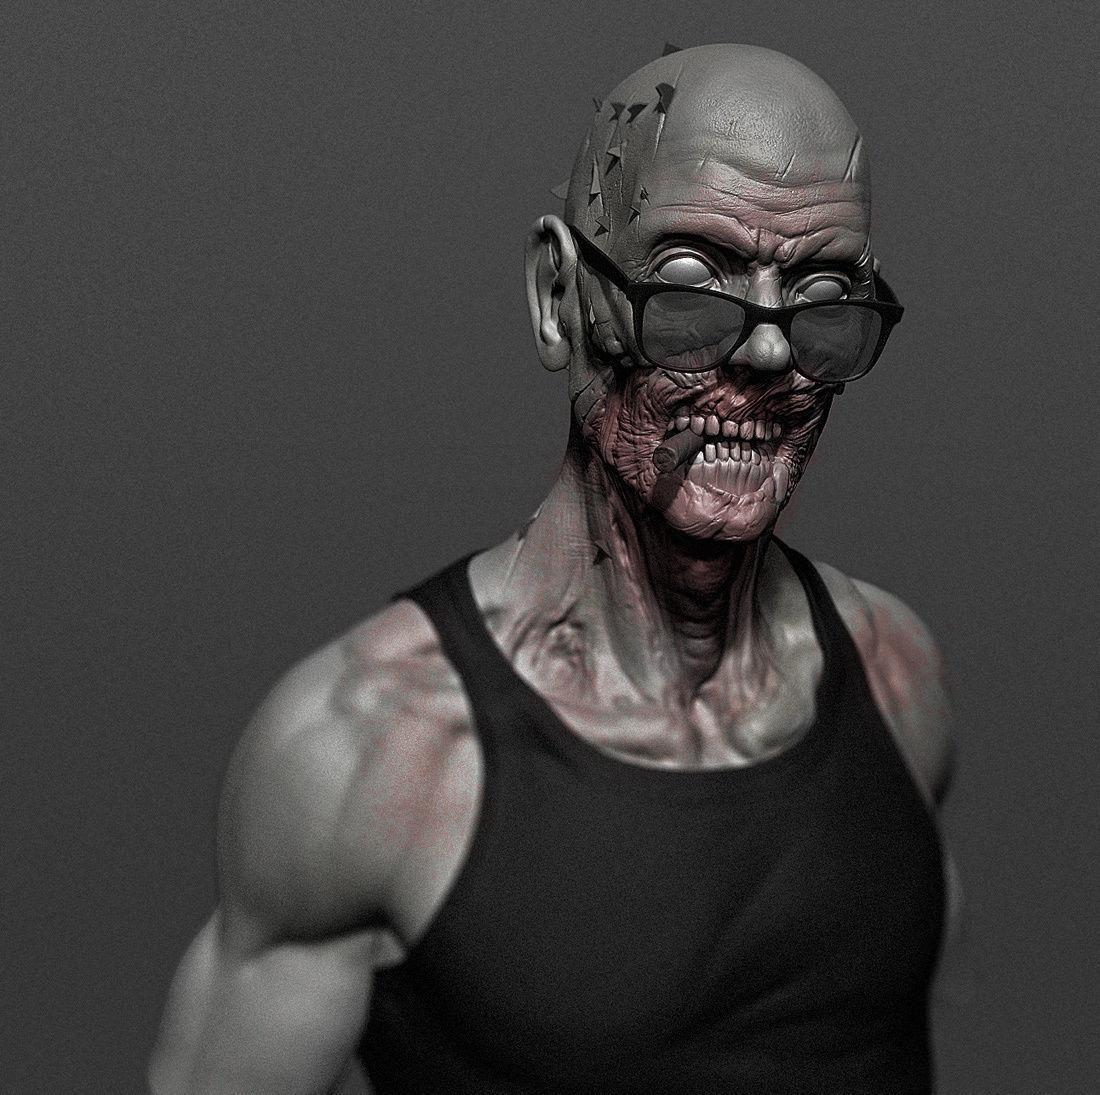 Cool Zombie